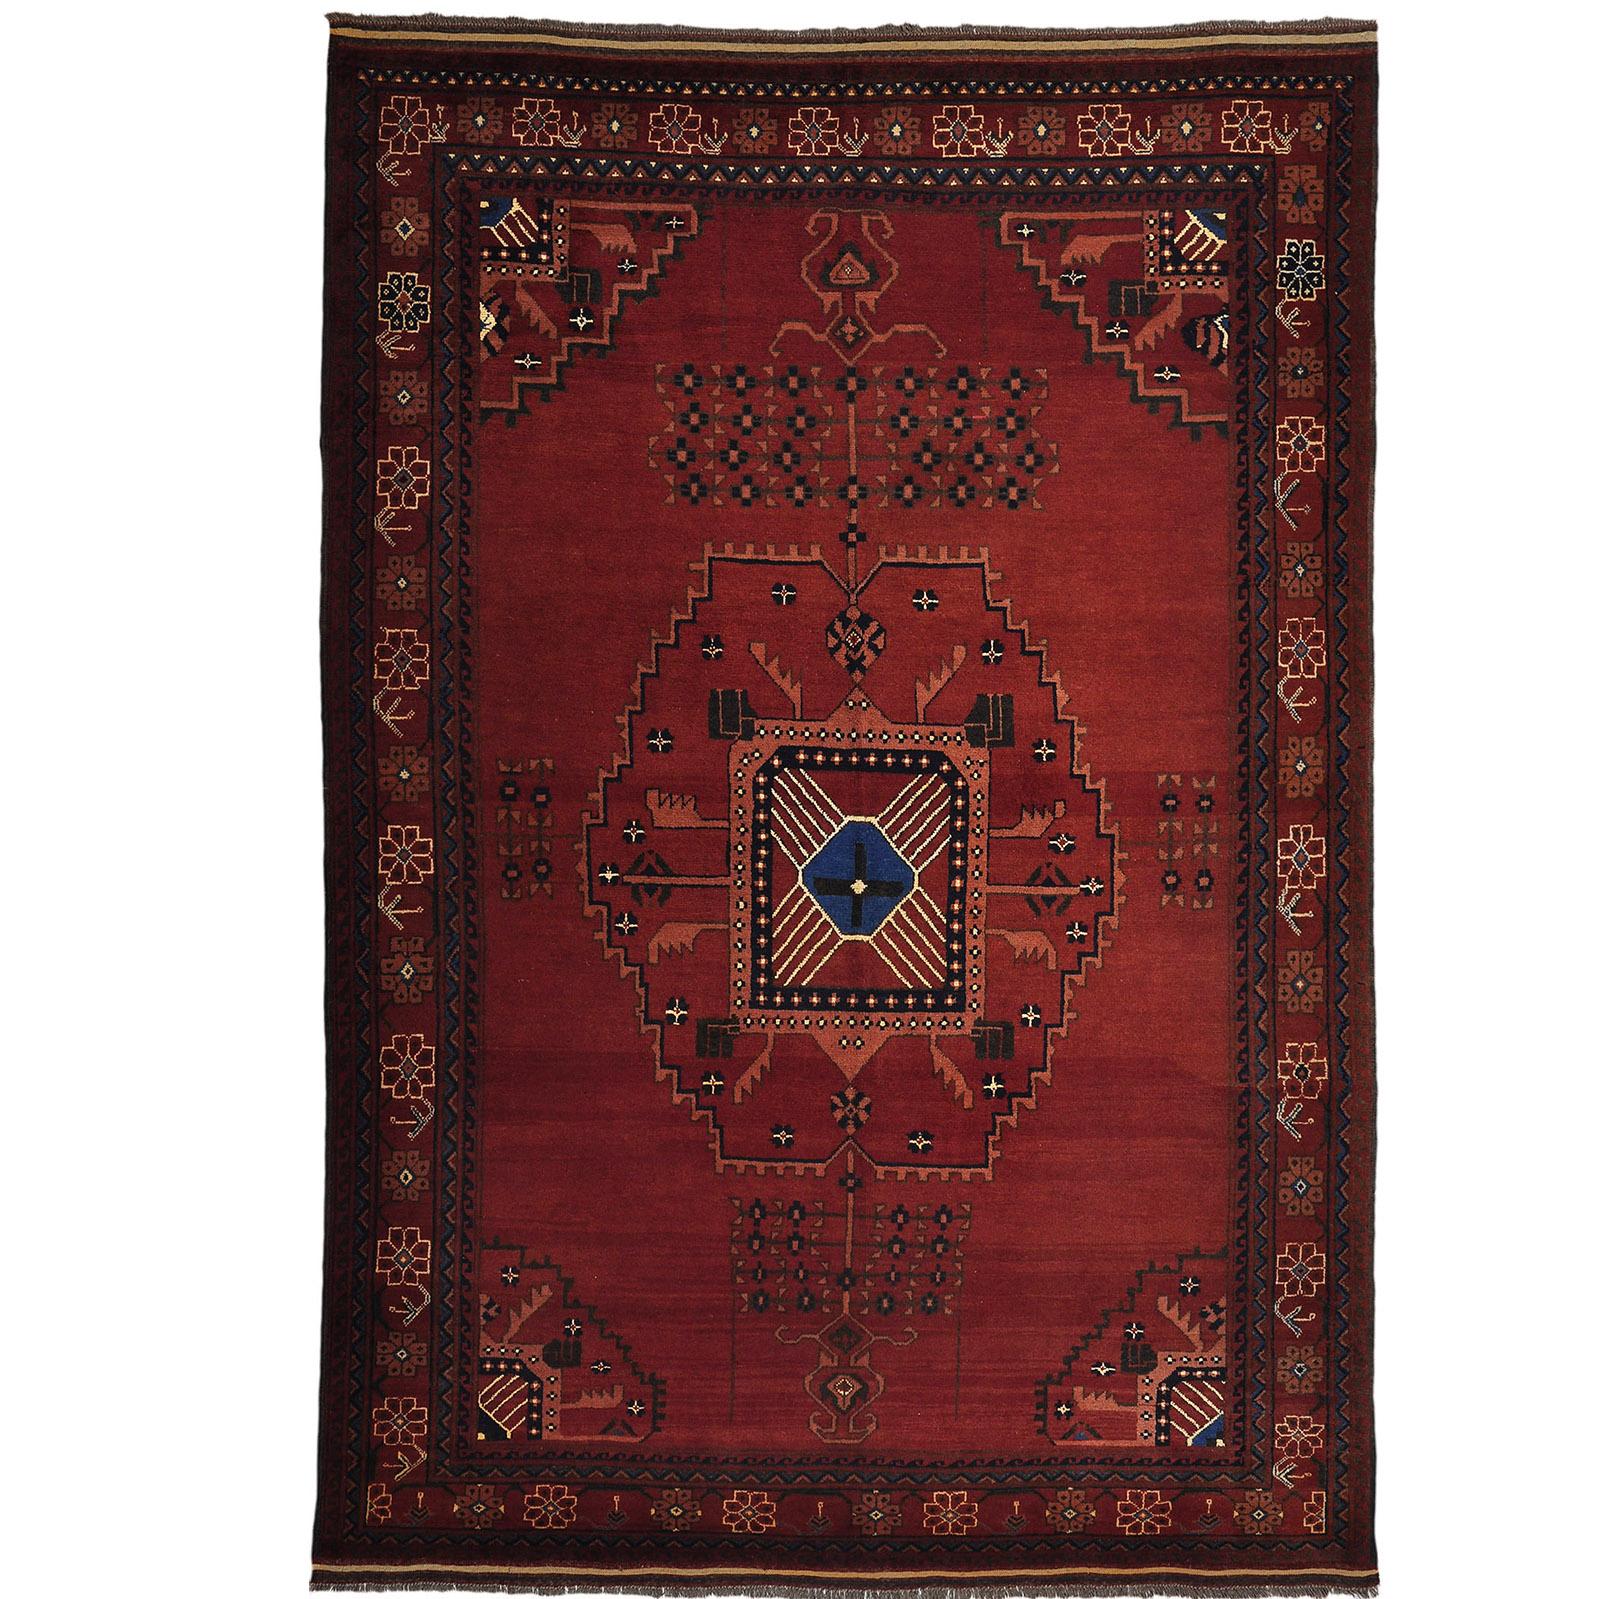 Afghan Mouri matta storlek 284x196 cm